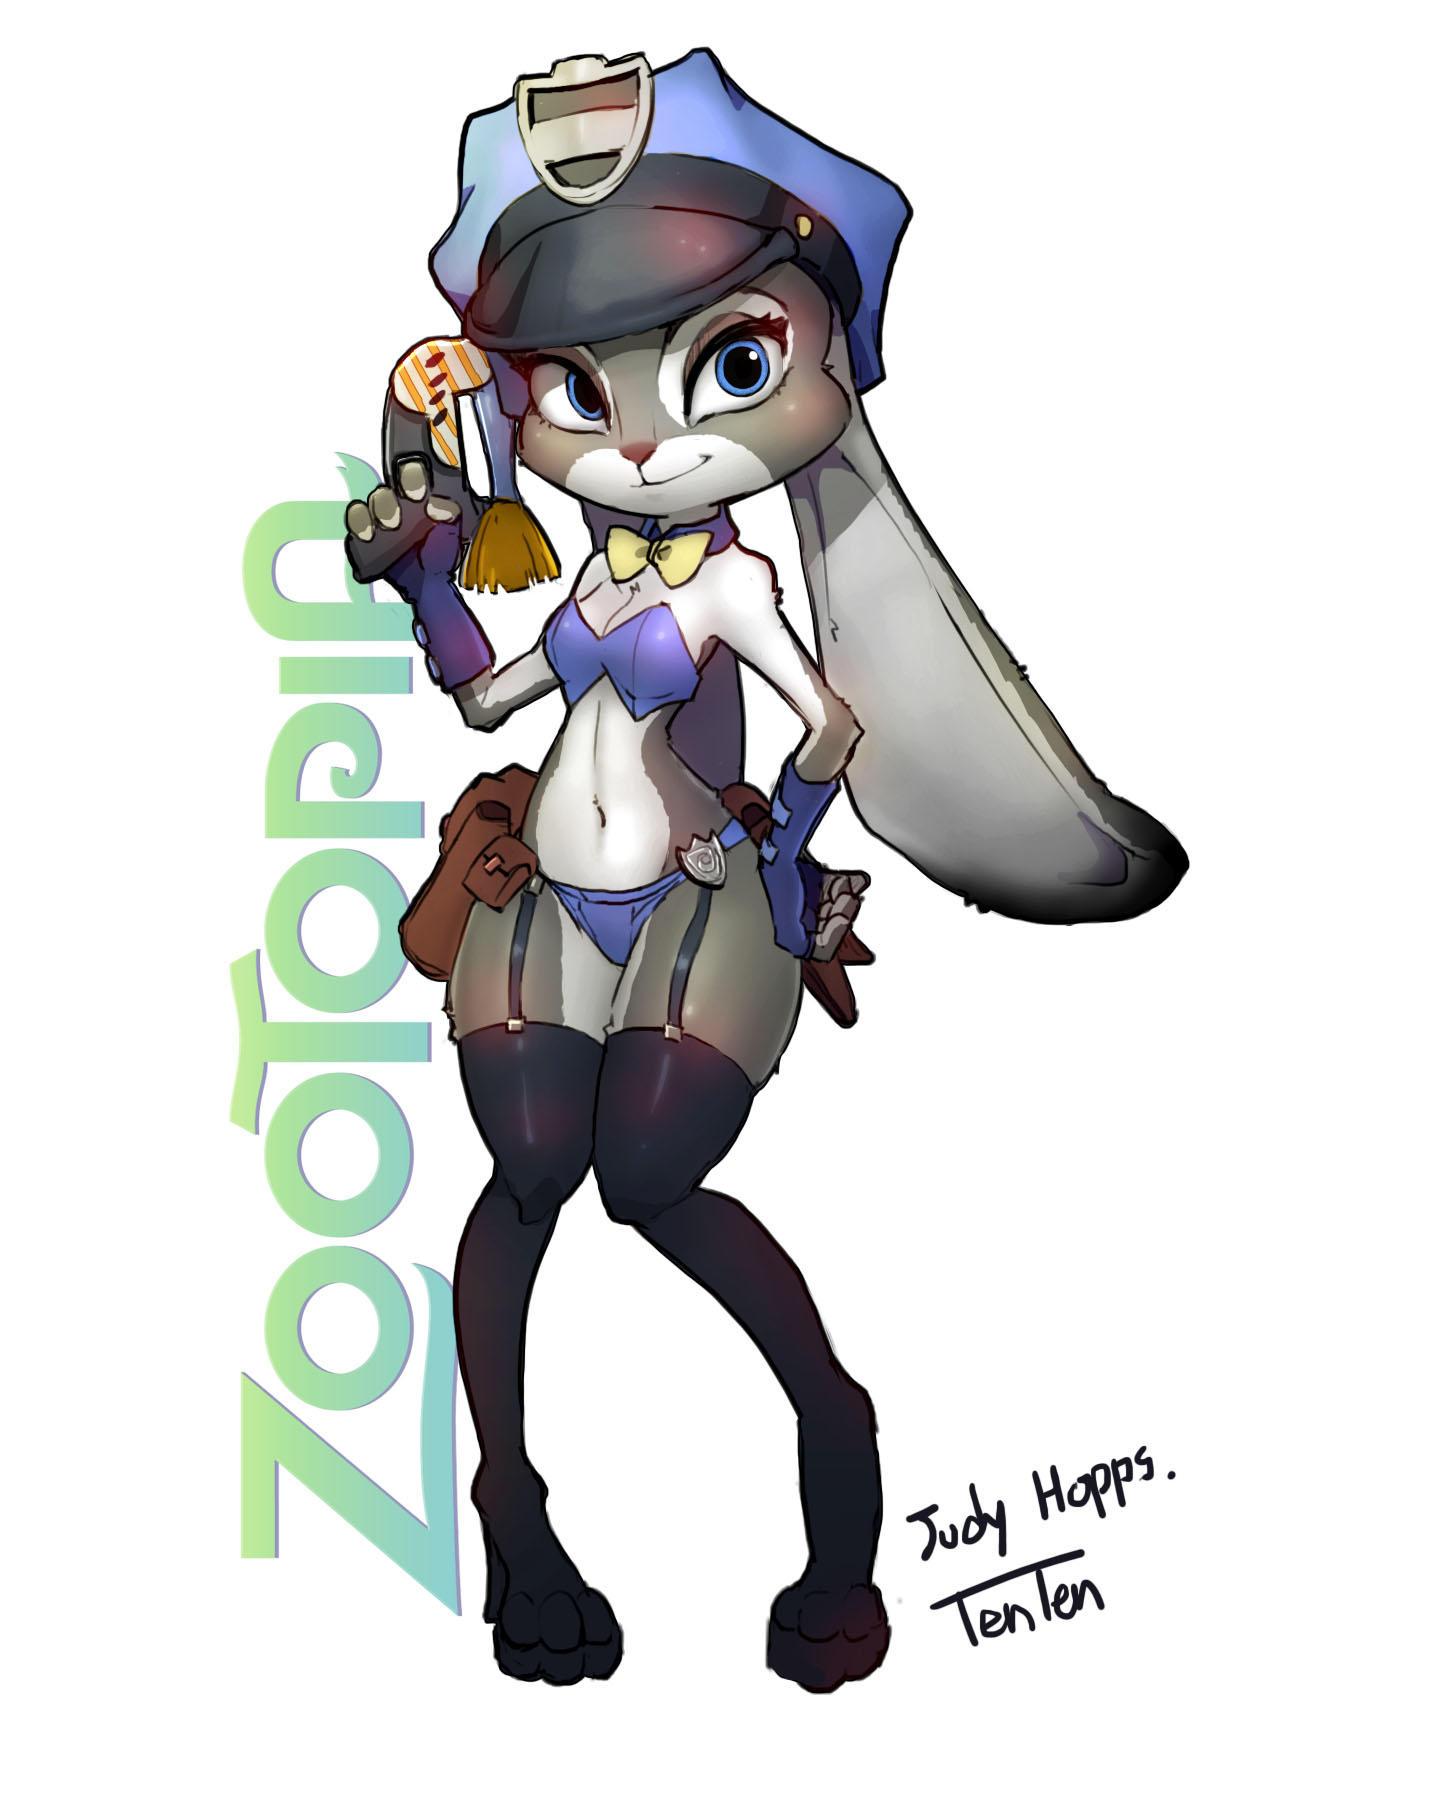 Ausmalbild Nick Und Judy Hopps Aus Zootopia: Judy Hopps By TenTen